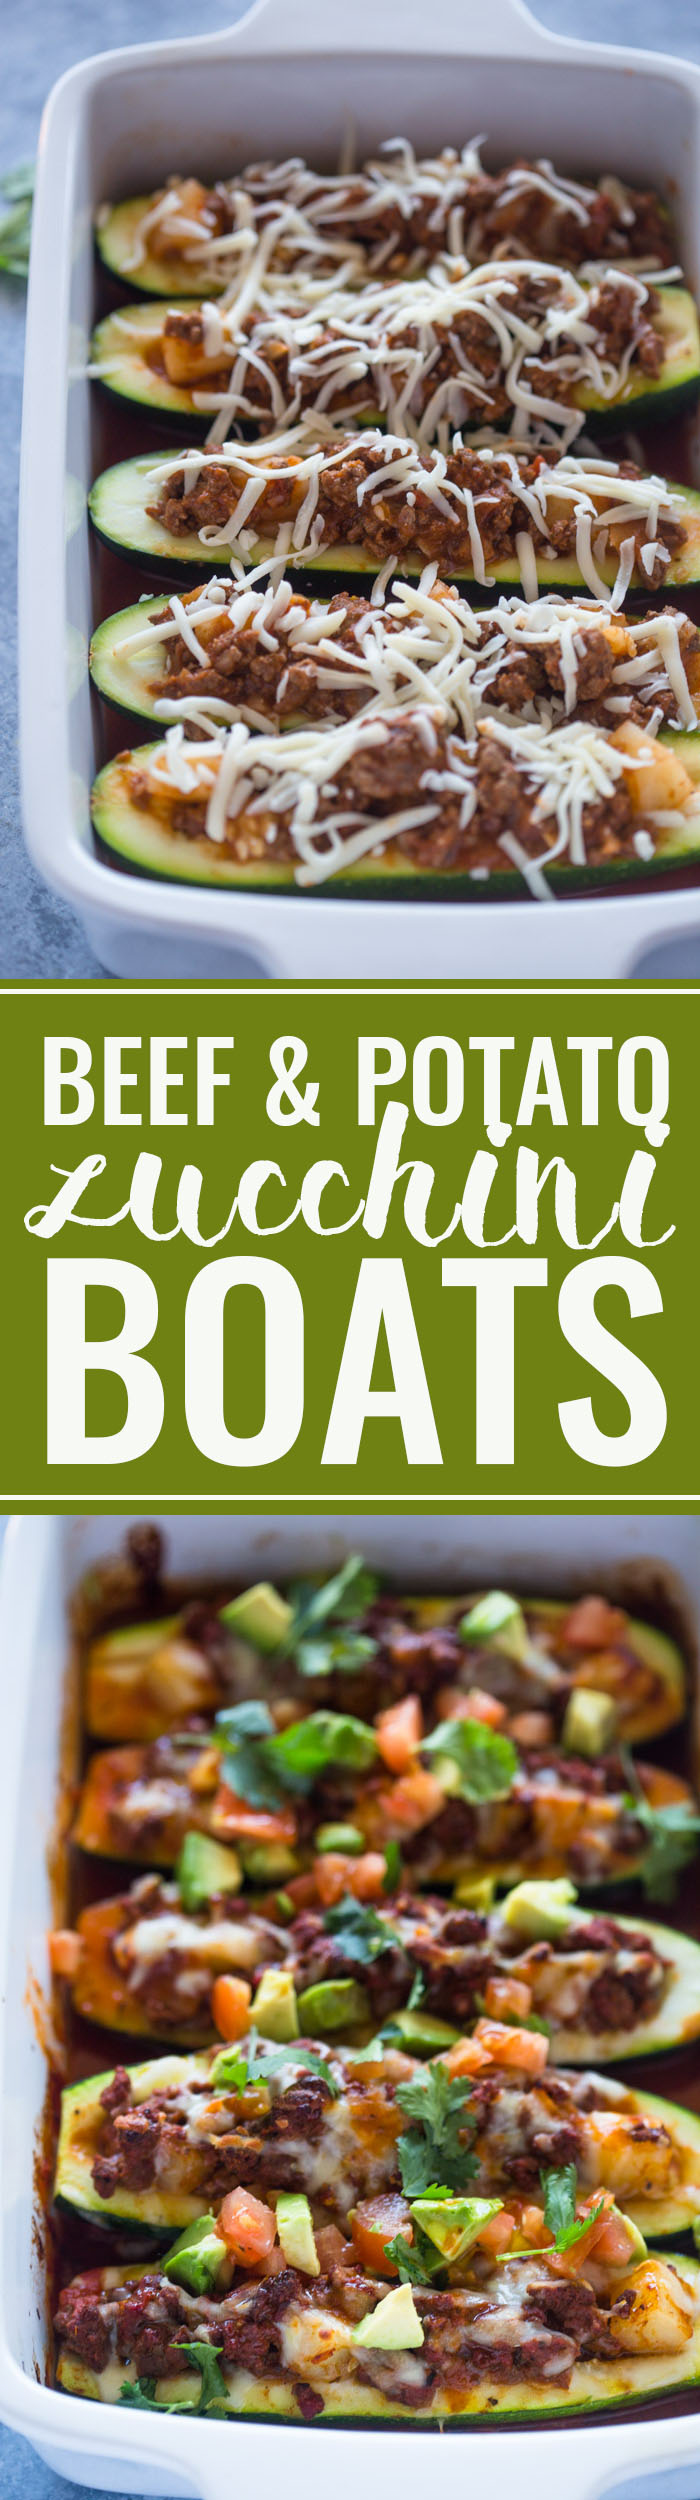 Beef and Potato Zucchini Boats